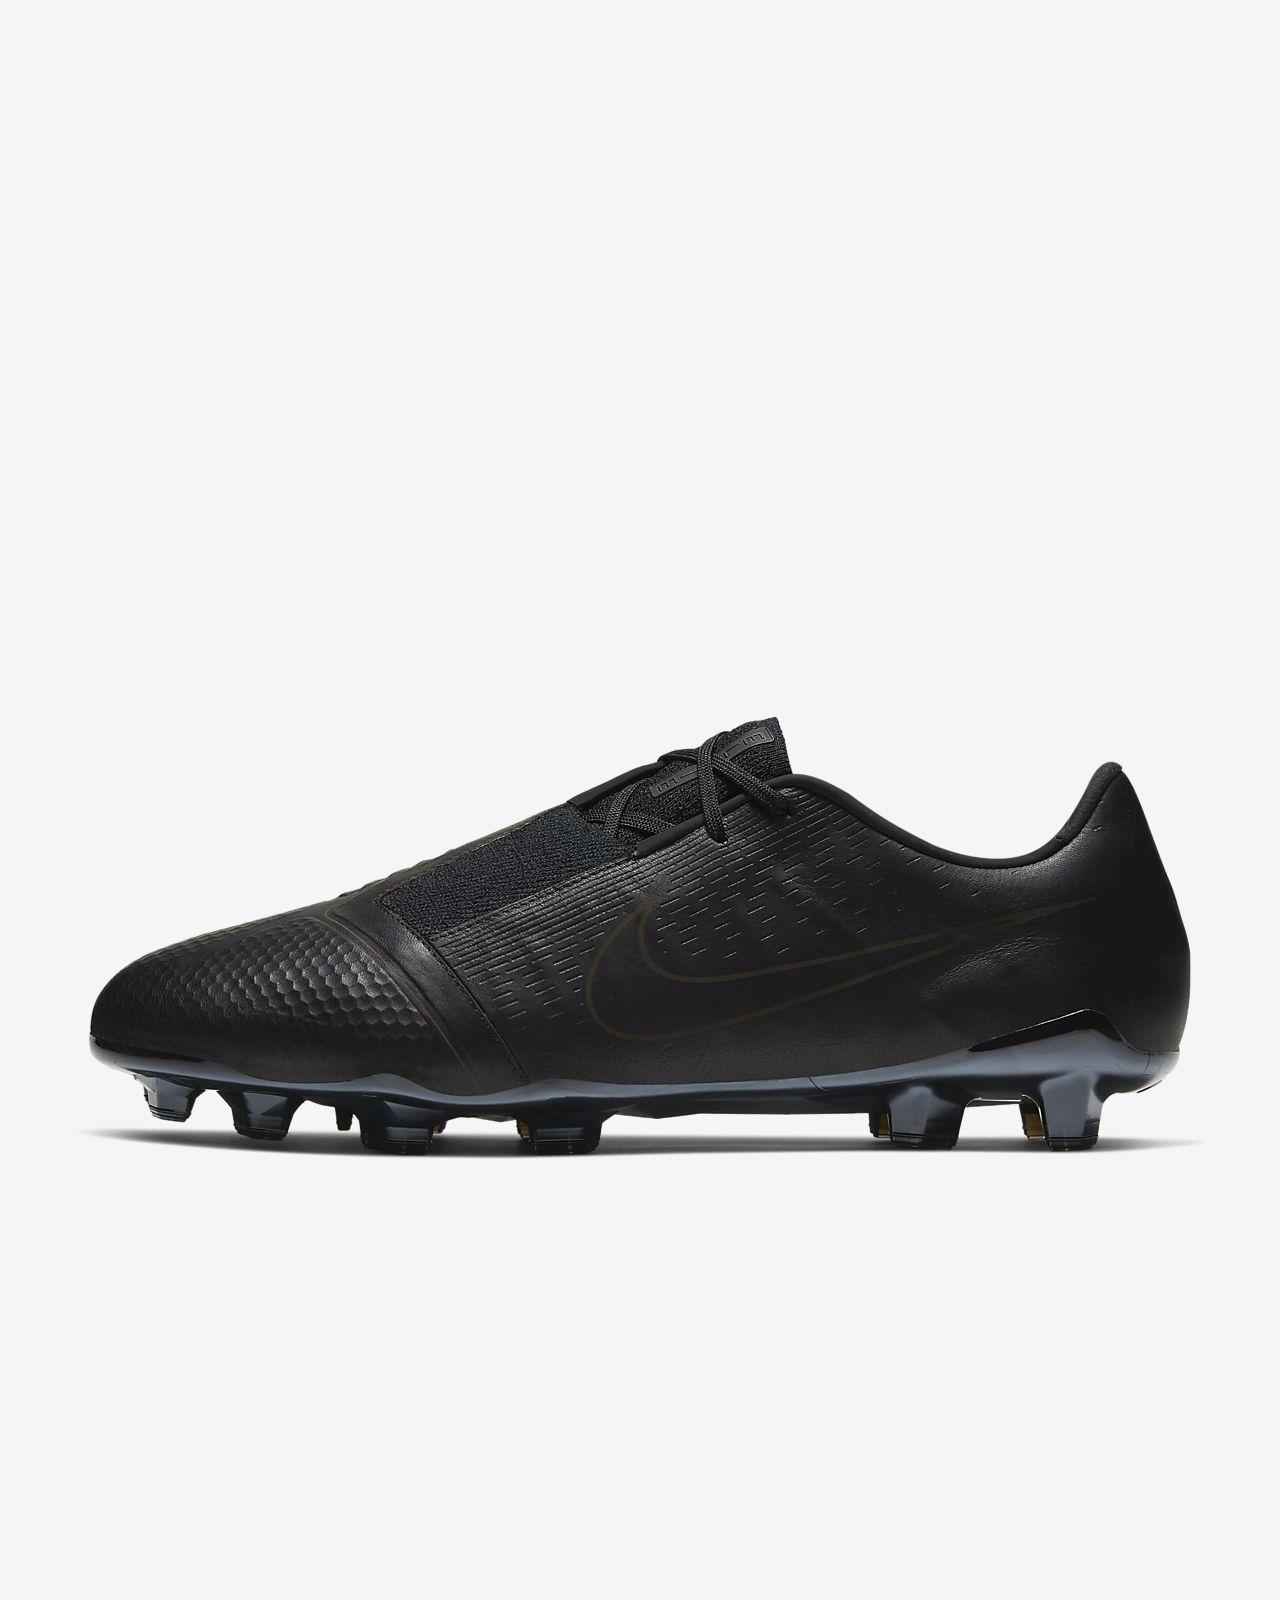 Nike PhantomVNM Elite Tech Craft FG Firm-Ground Football Boot